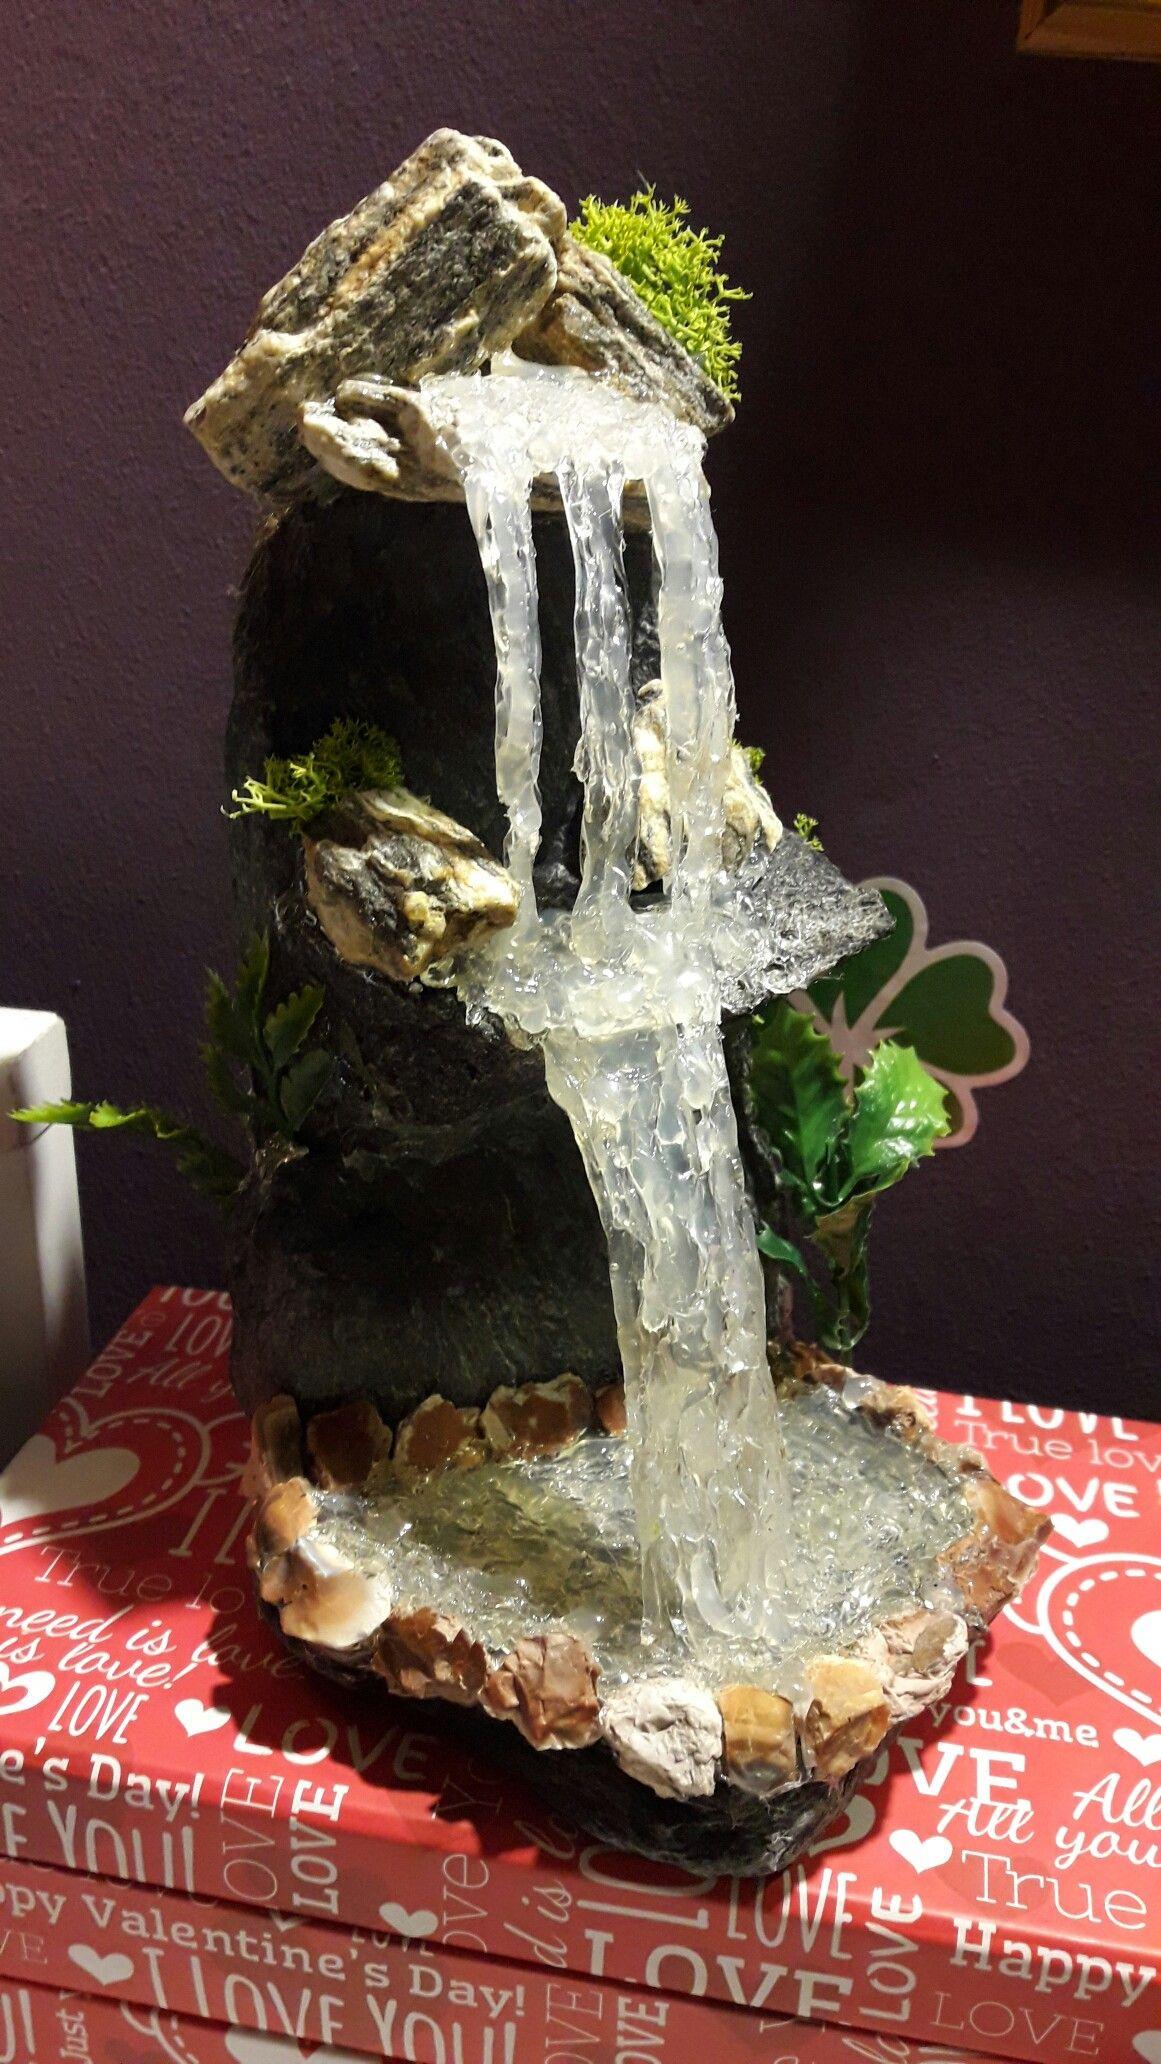 My Next Waterfall Hot Glue Waterfall Craft Idea Diy